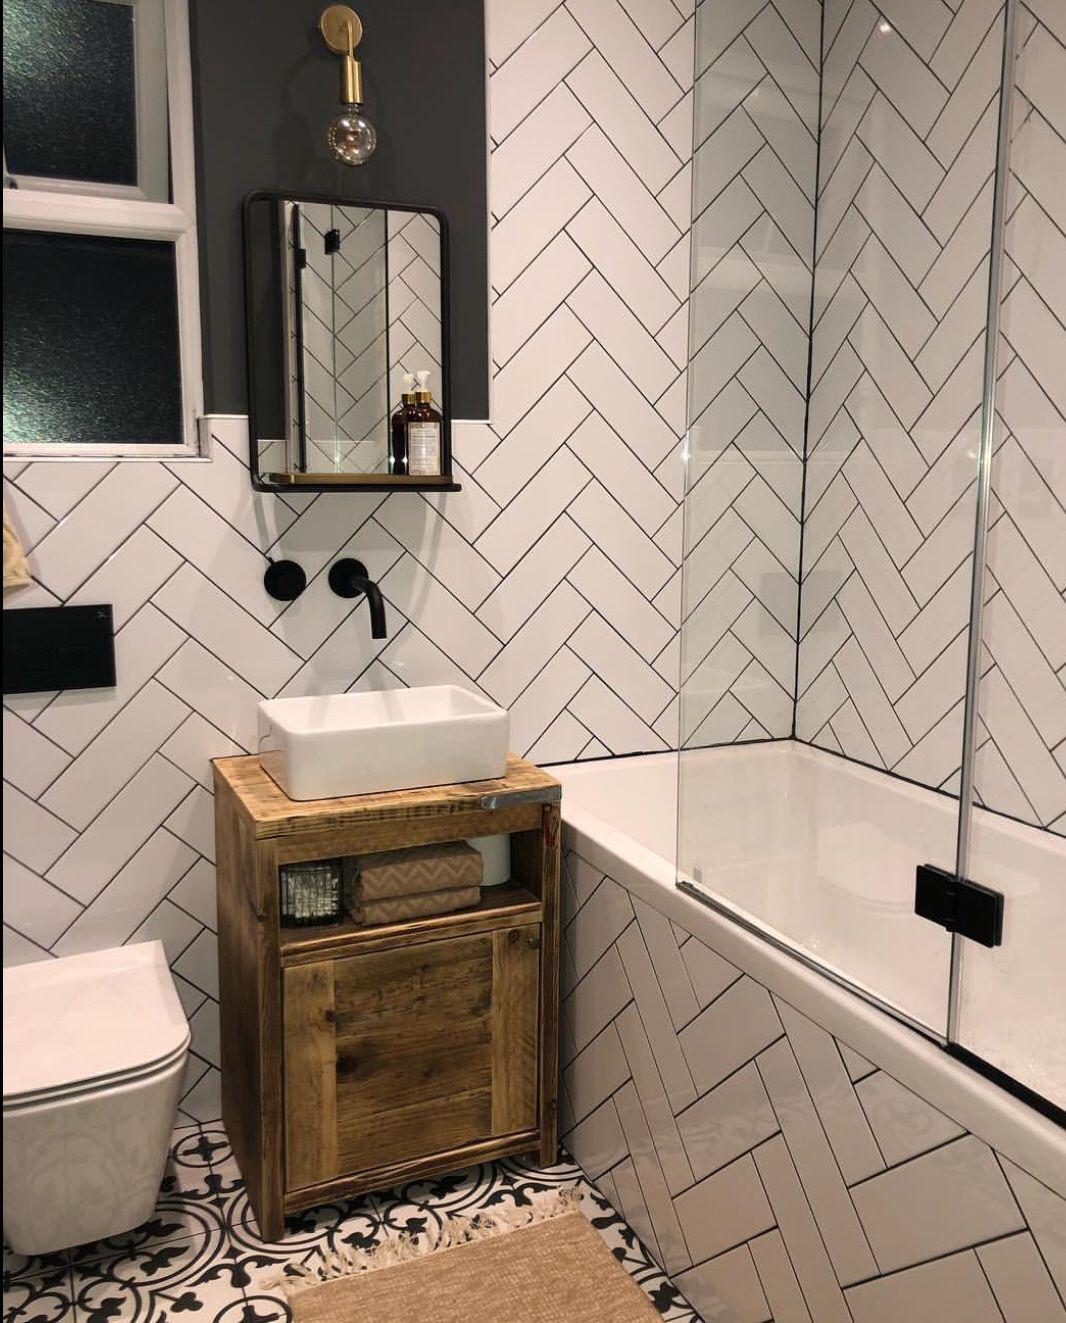 Metro XL FLAT White Gloss Wall Tiles 10x30cm | Small ...